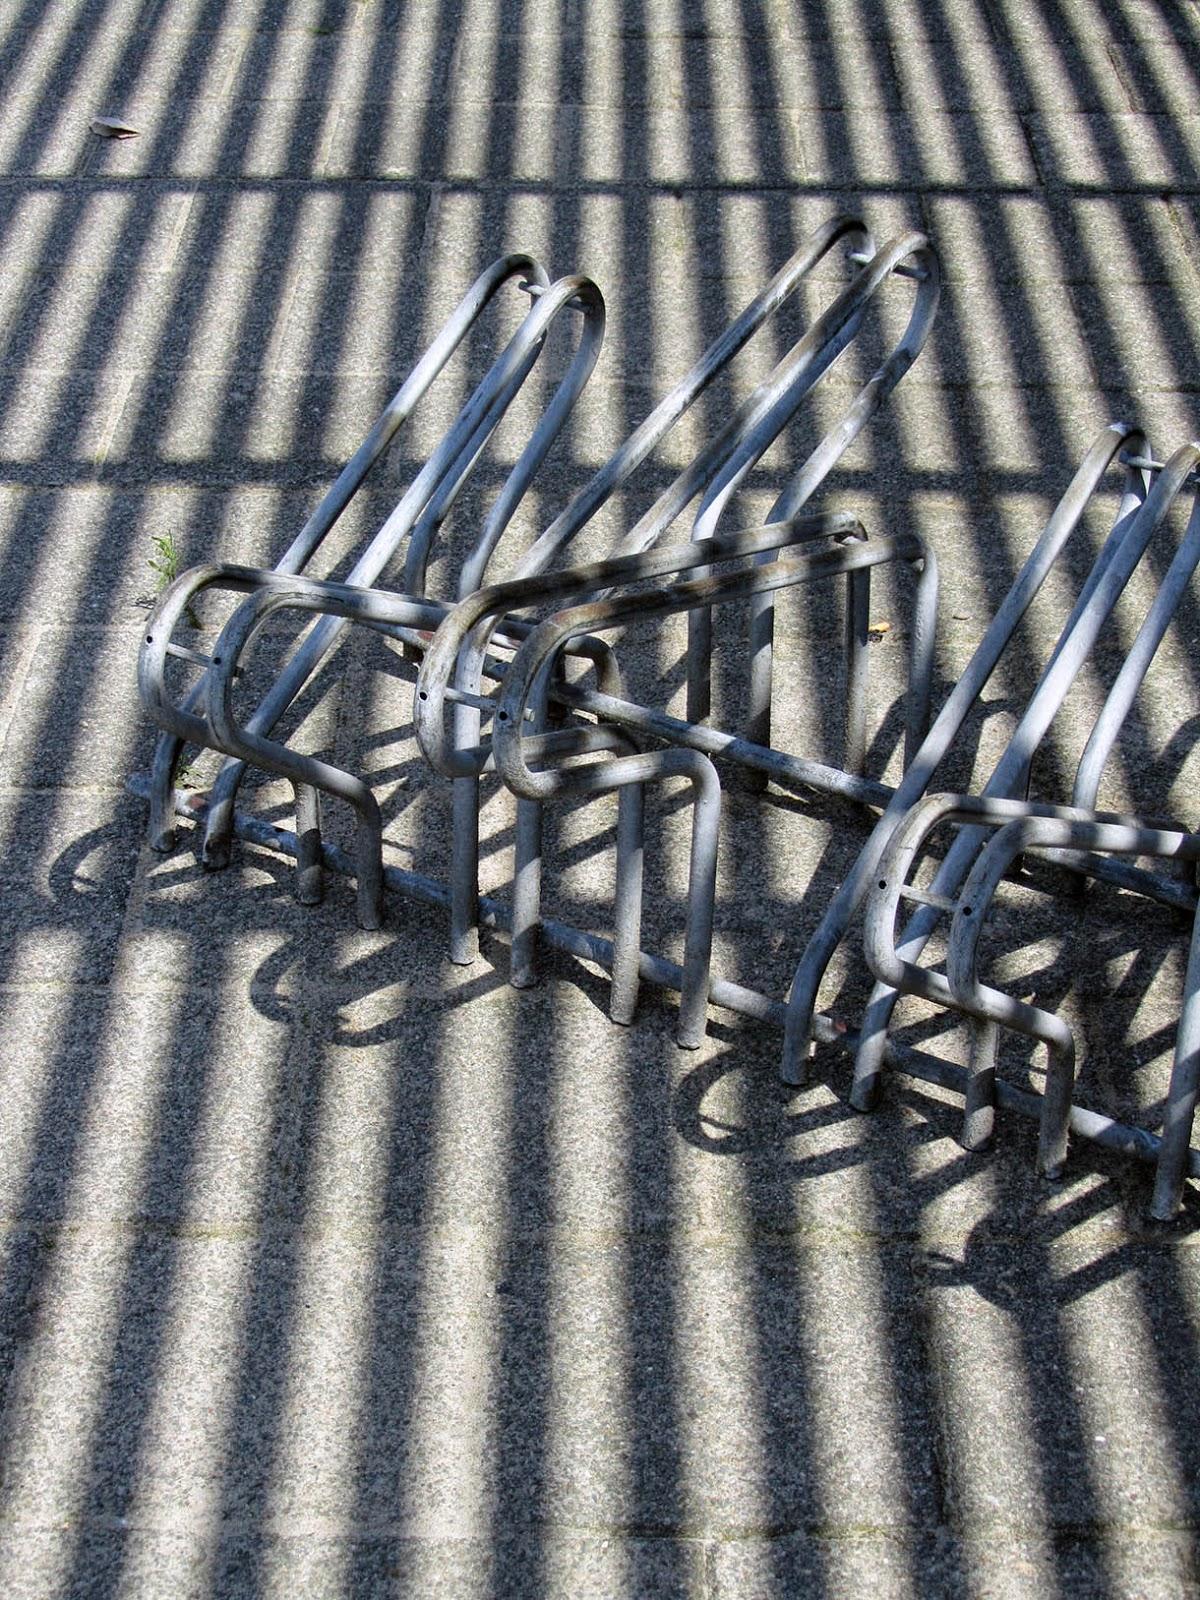 shadows on bicycle rack